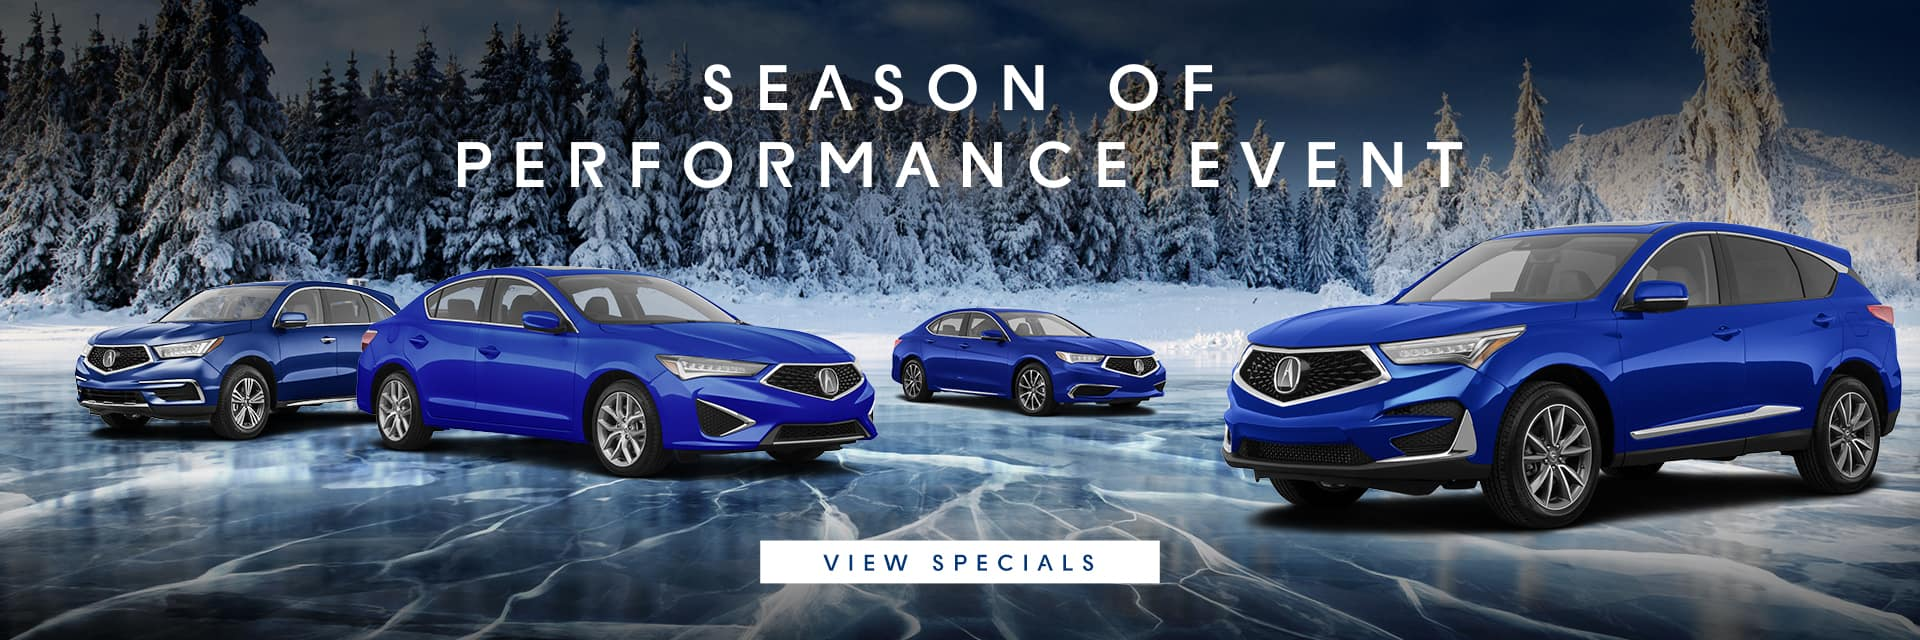 Season of Performance Event